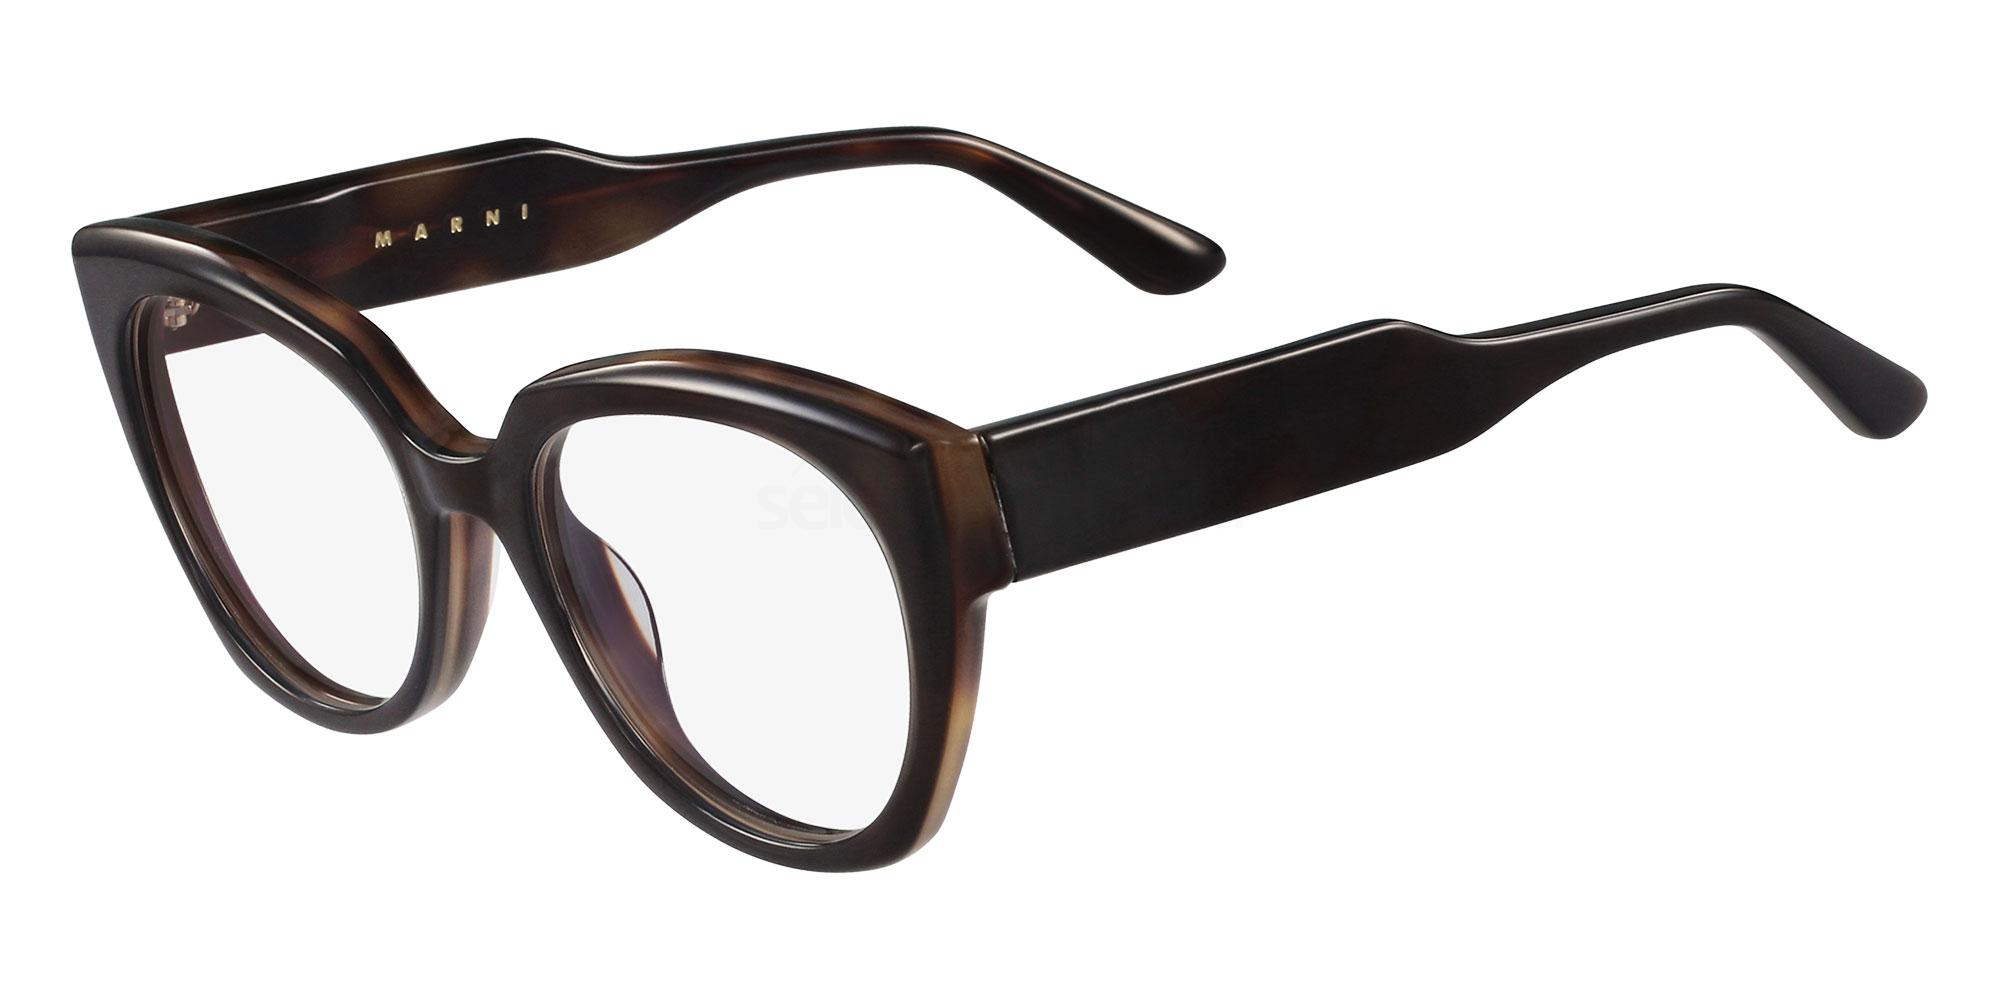 004 ME2607 Glasses, Marni